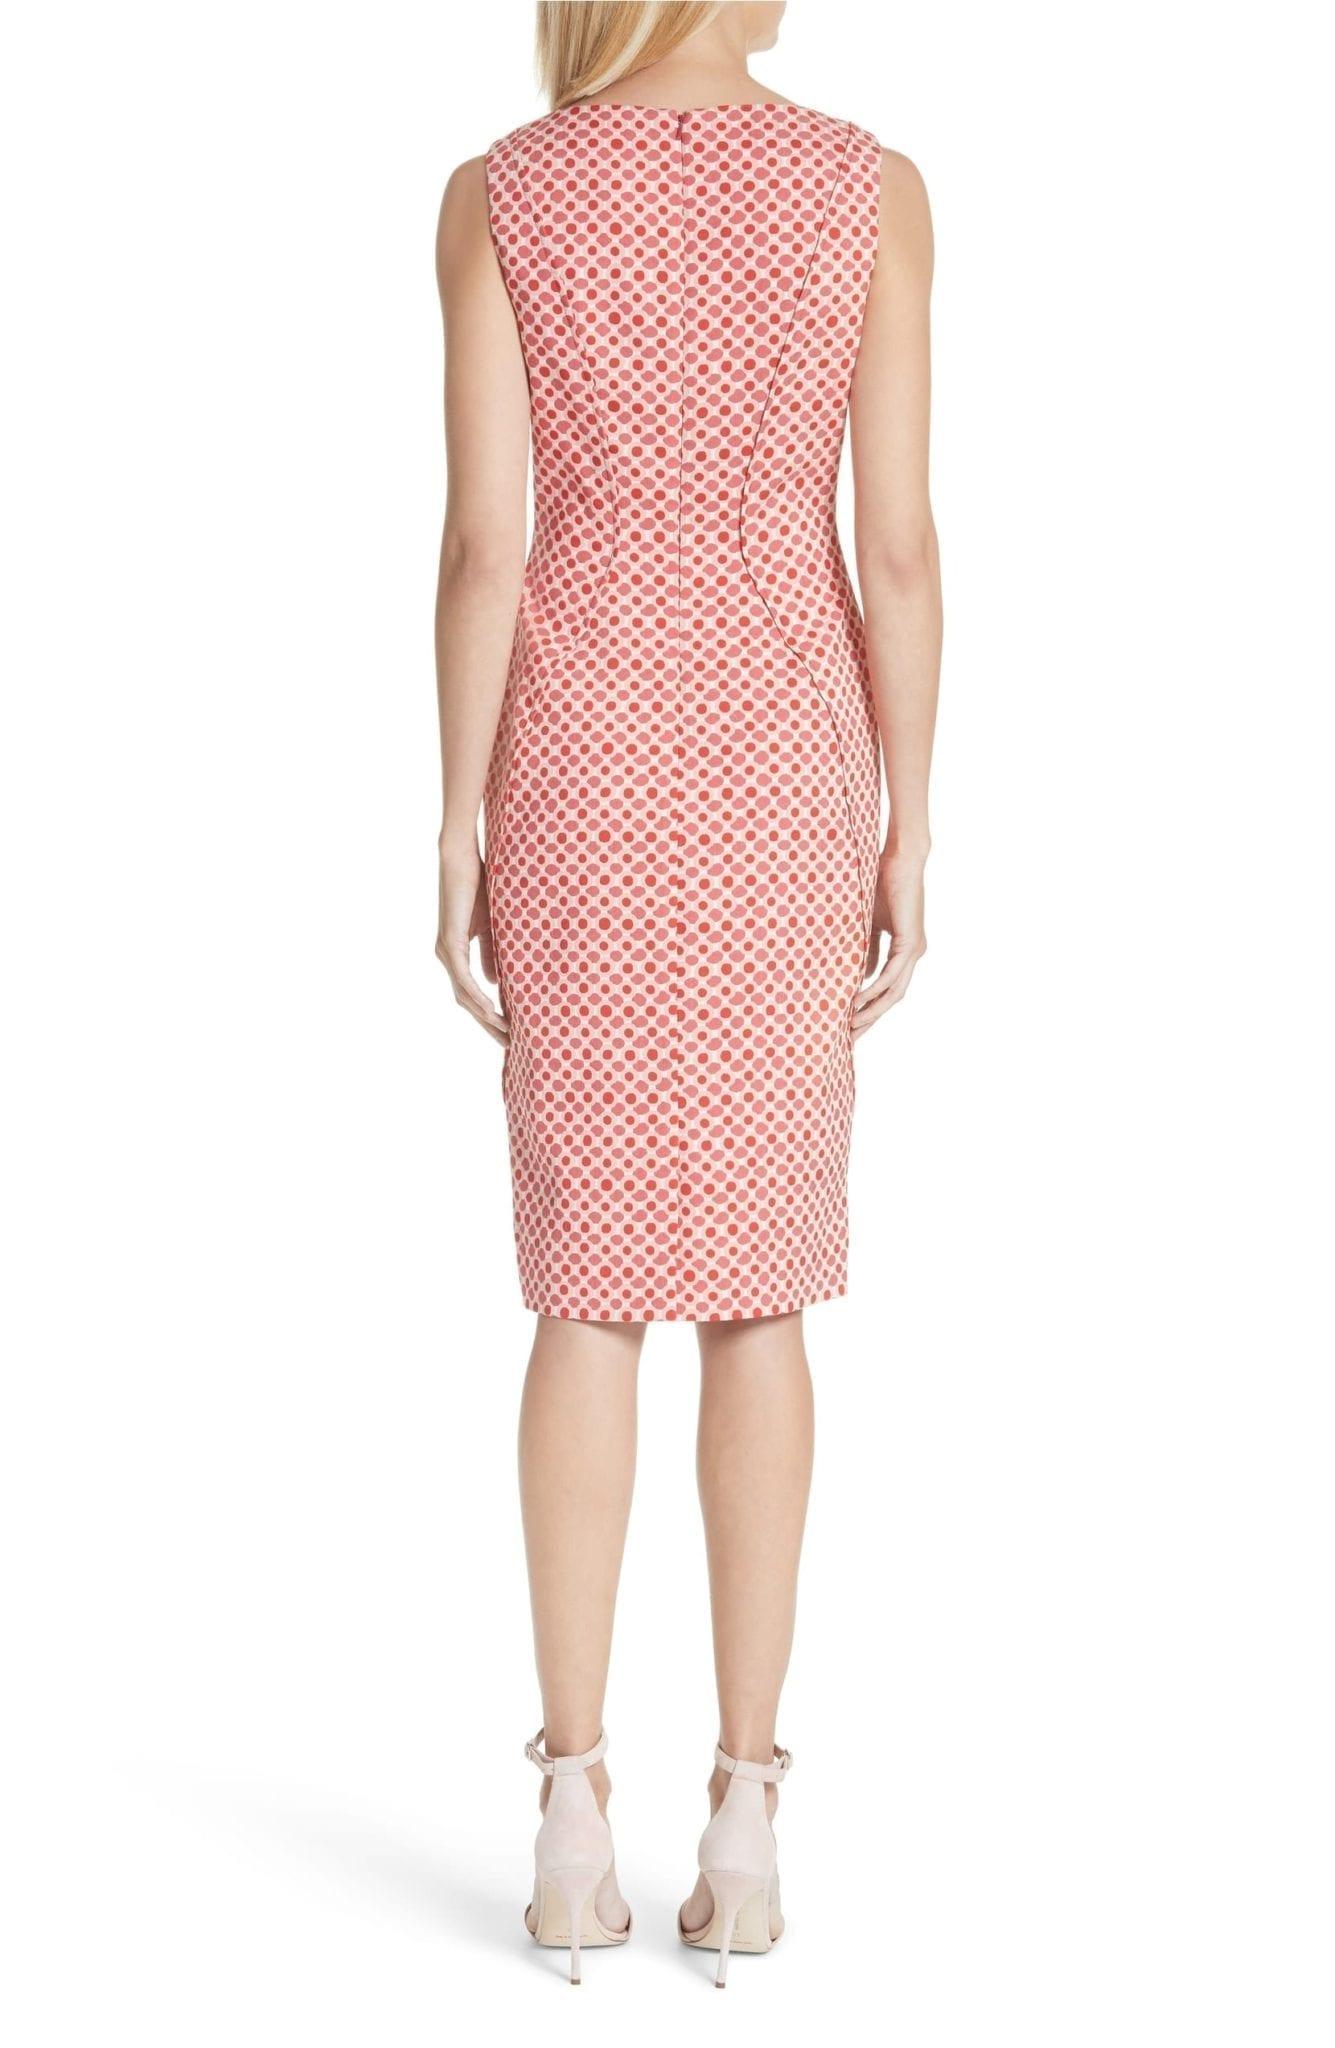 LELA ROSE Polka Dot Stretch Jacquard Sheath Red / Multicolored Dress ...